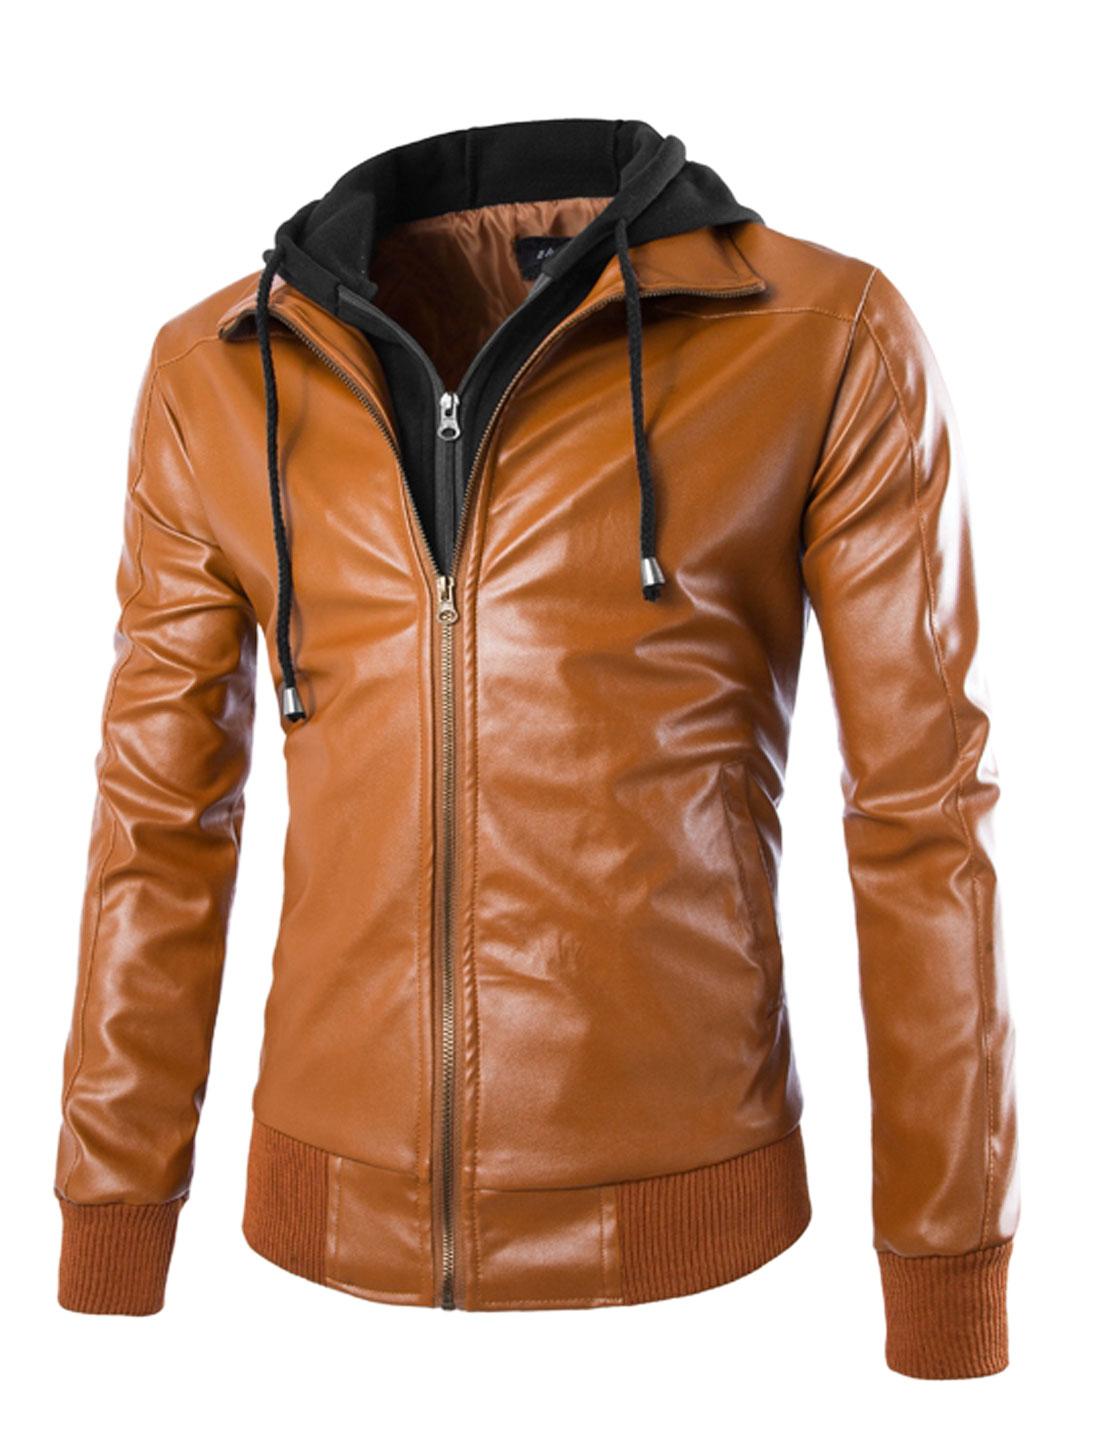 Men Turn Down Collar Long Sleeves PU Leather Hooded Jacket Brown M